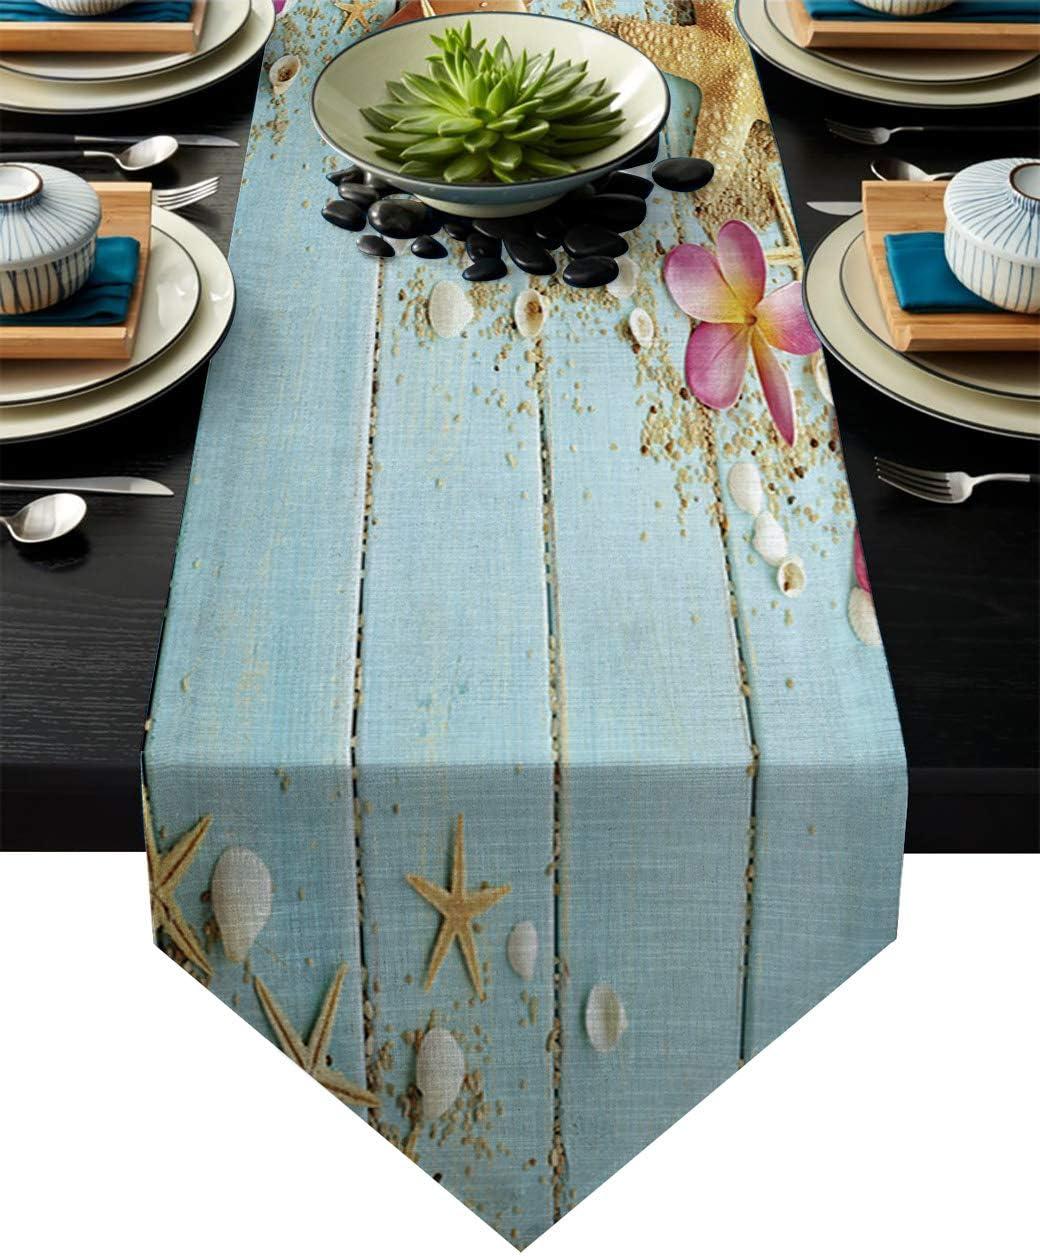 "Vandarllin Cotton Linen Table Runner Dresser Scarves Beach Theme Seashells&Blue Rustic Wood Non-Slip Burlap Table Setting Decor for Wedding Party Holiday Dinner Home, 14""x72"""